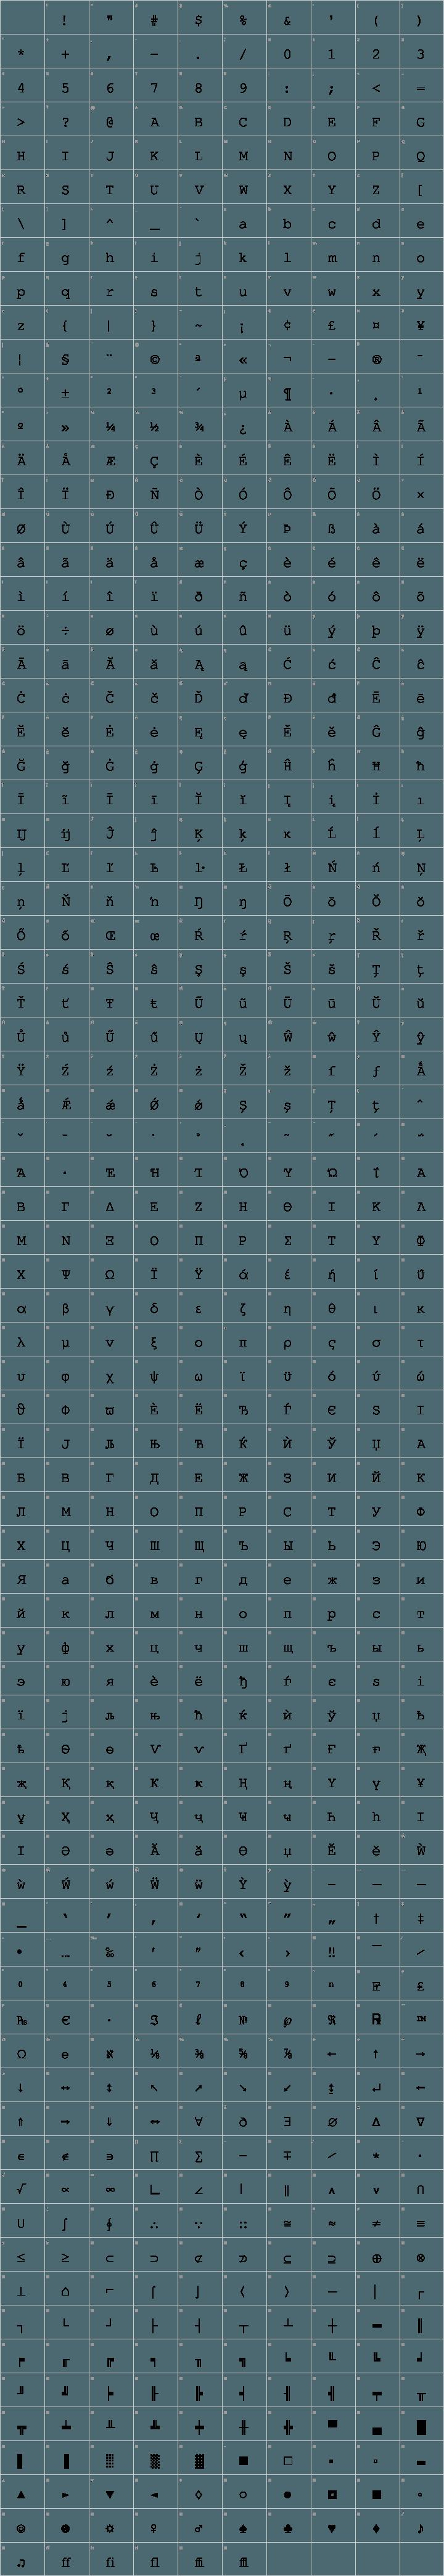 Nimbus Mono Font Free by URW++ » Font Squirrel